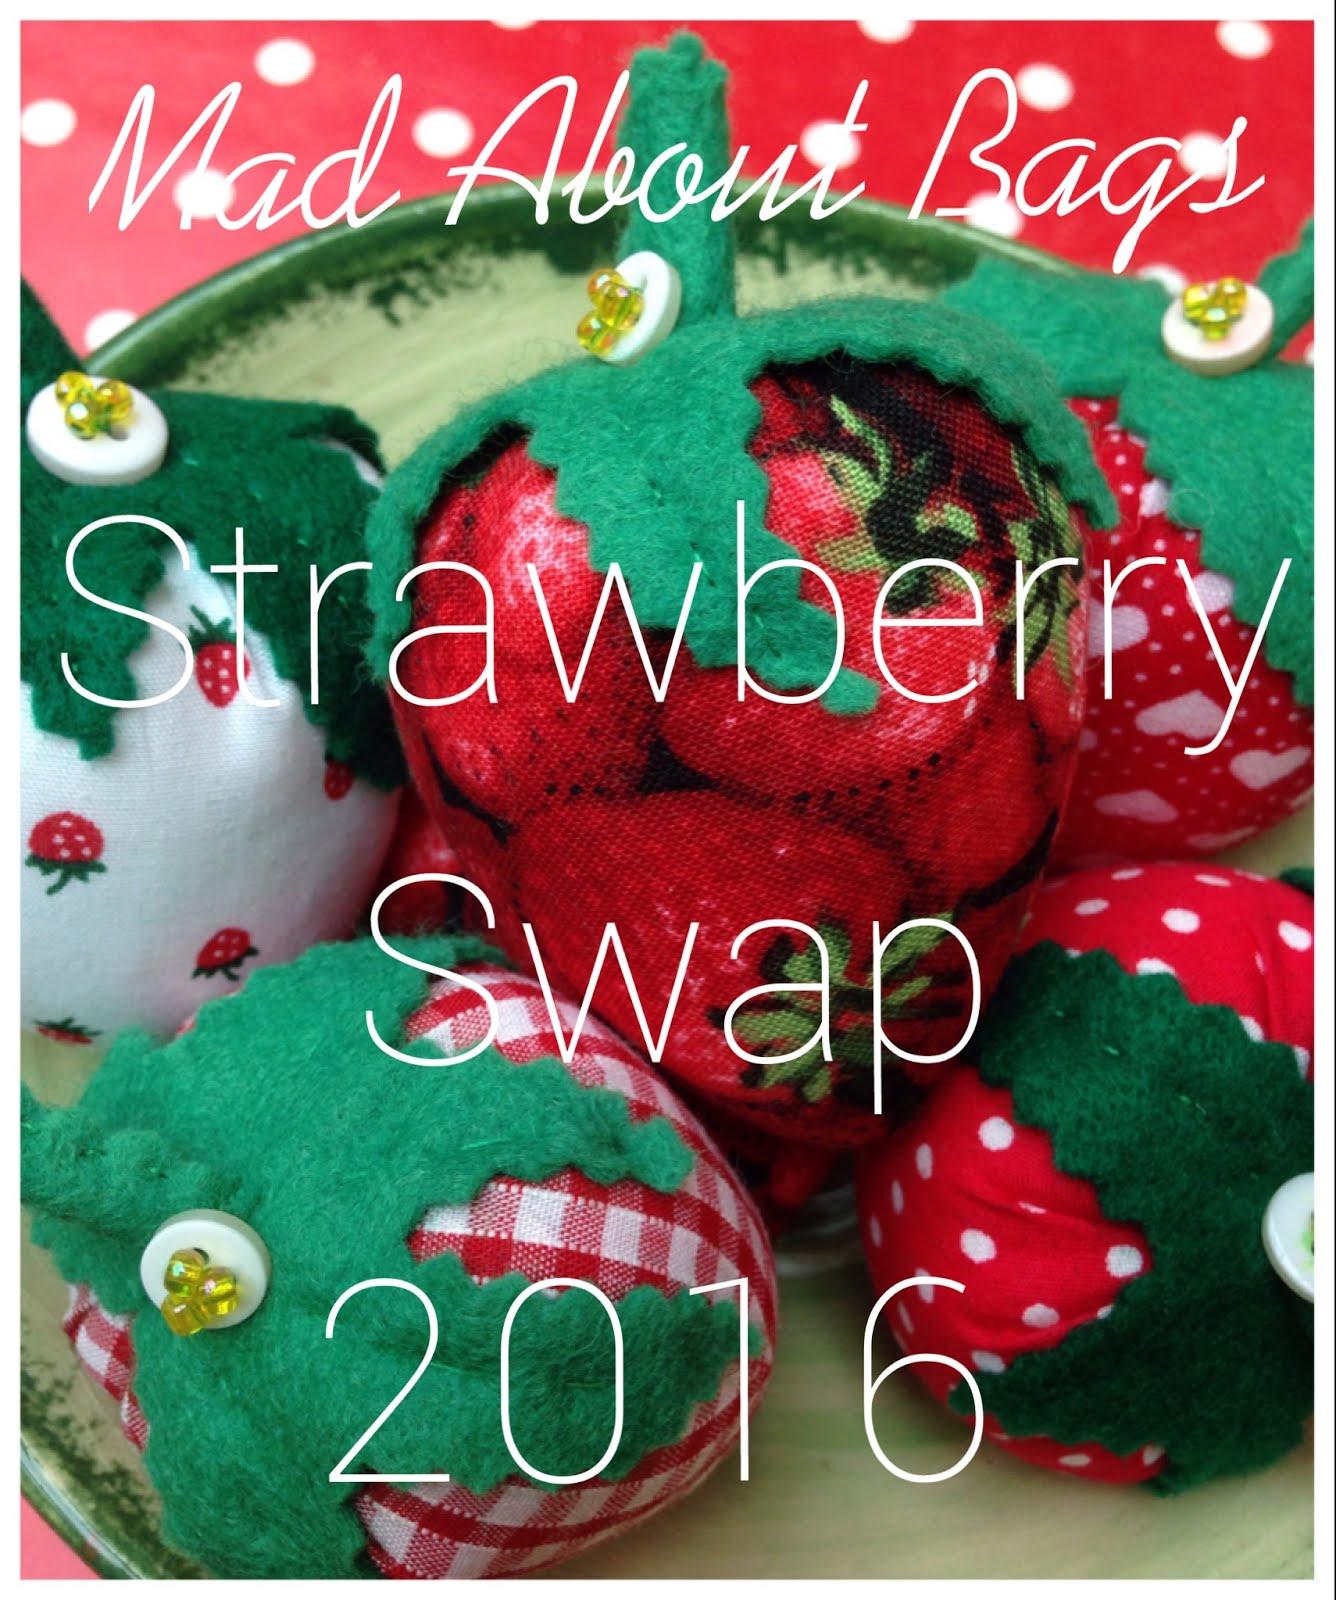 Strawberry Swap 2016